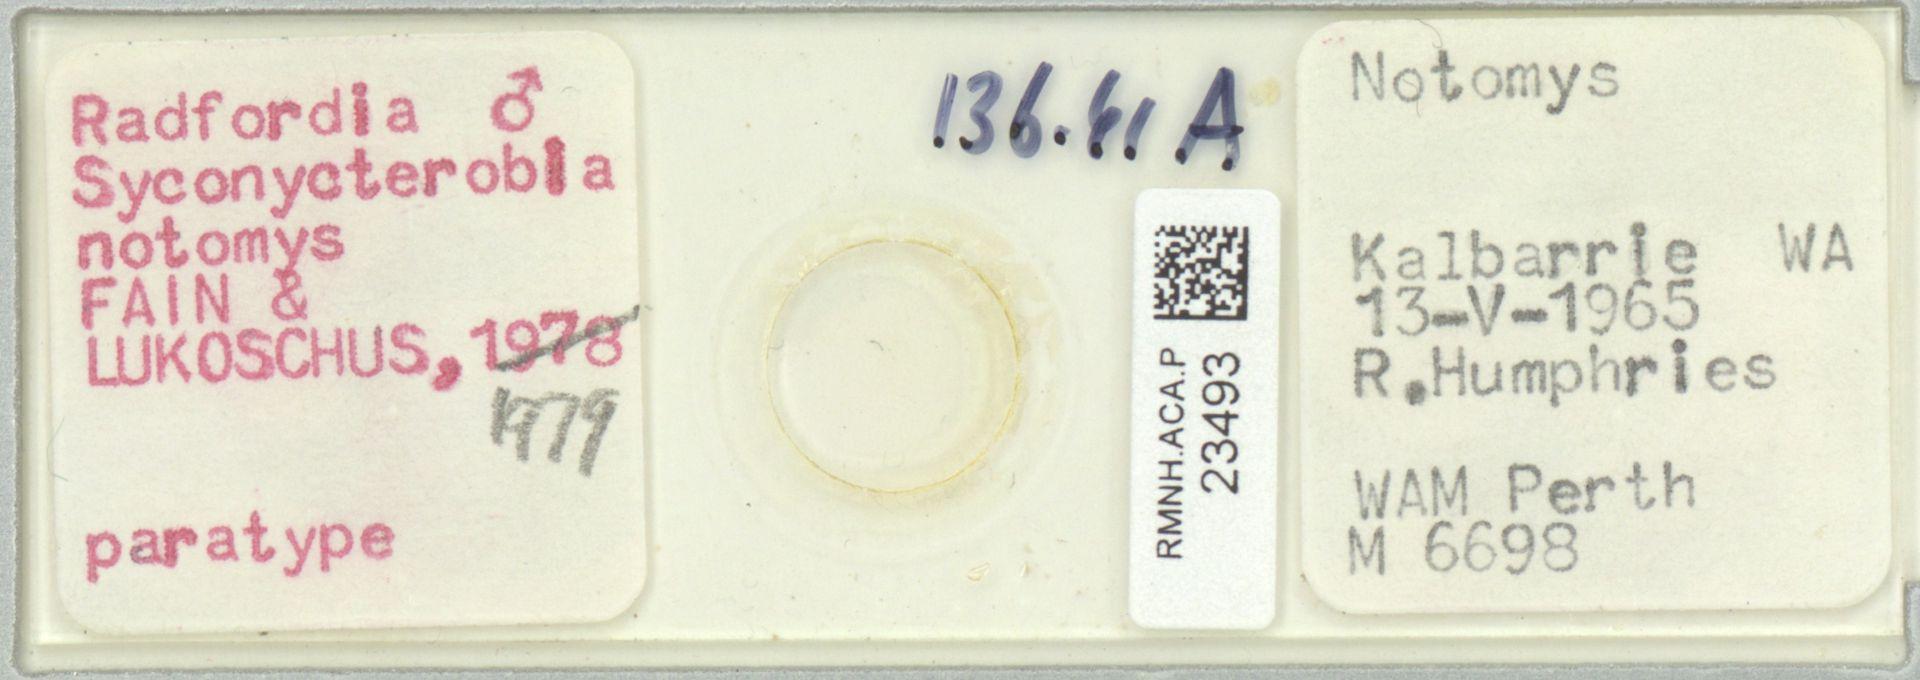 RMNH.ACA.P.23493 | Radfordia (Syconycterobia) notomys Fain & Lukoschus, 1979